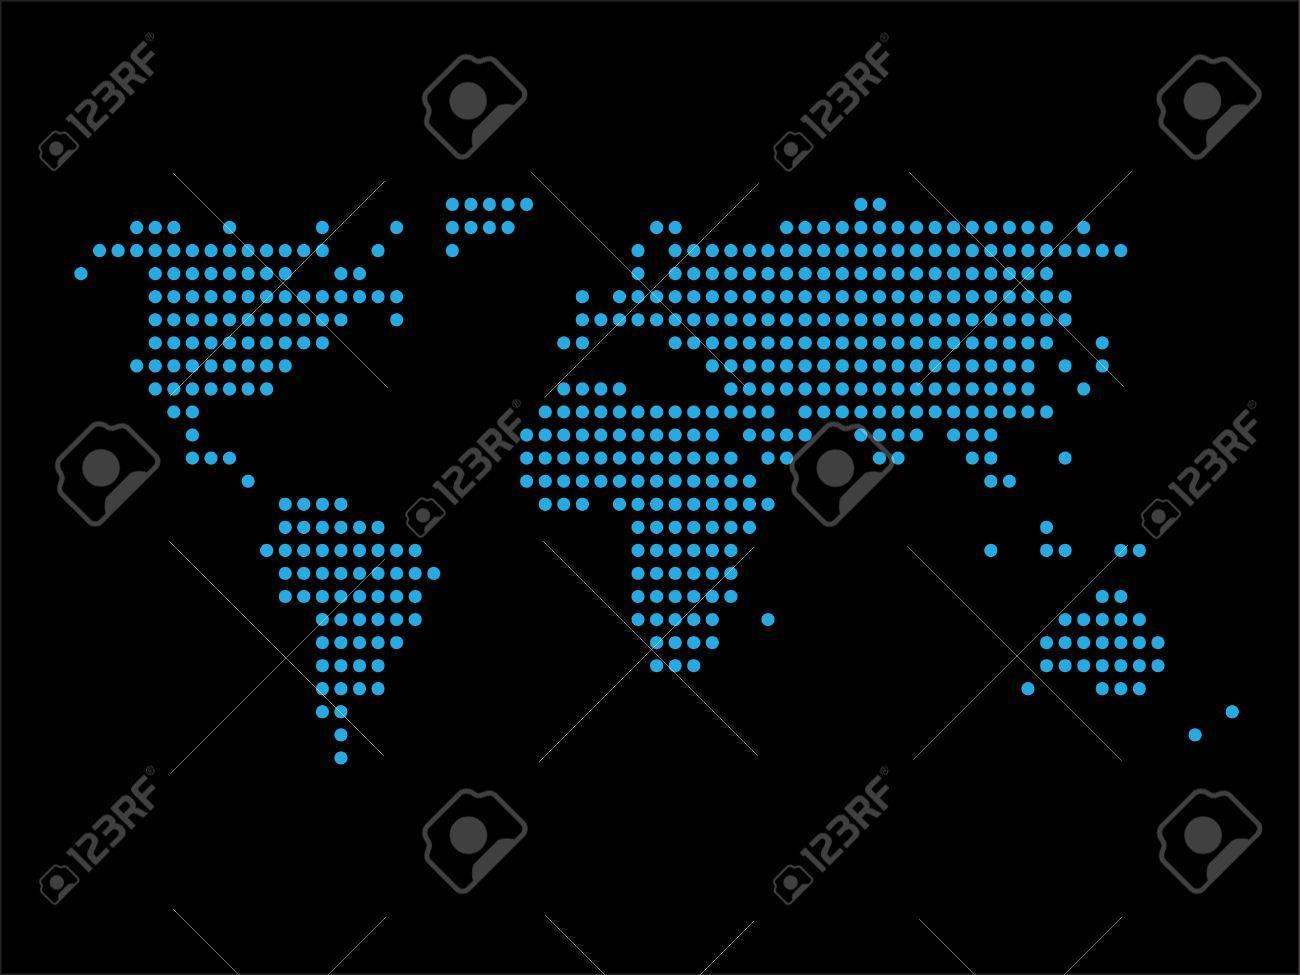 World map black background world distribution business royalty free vector world map black background world distribution business gumiabroncs Images